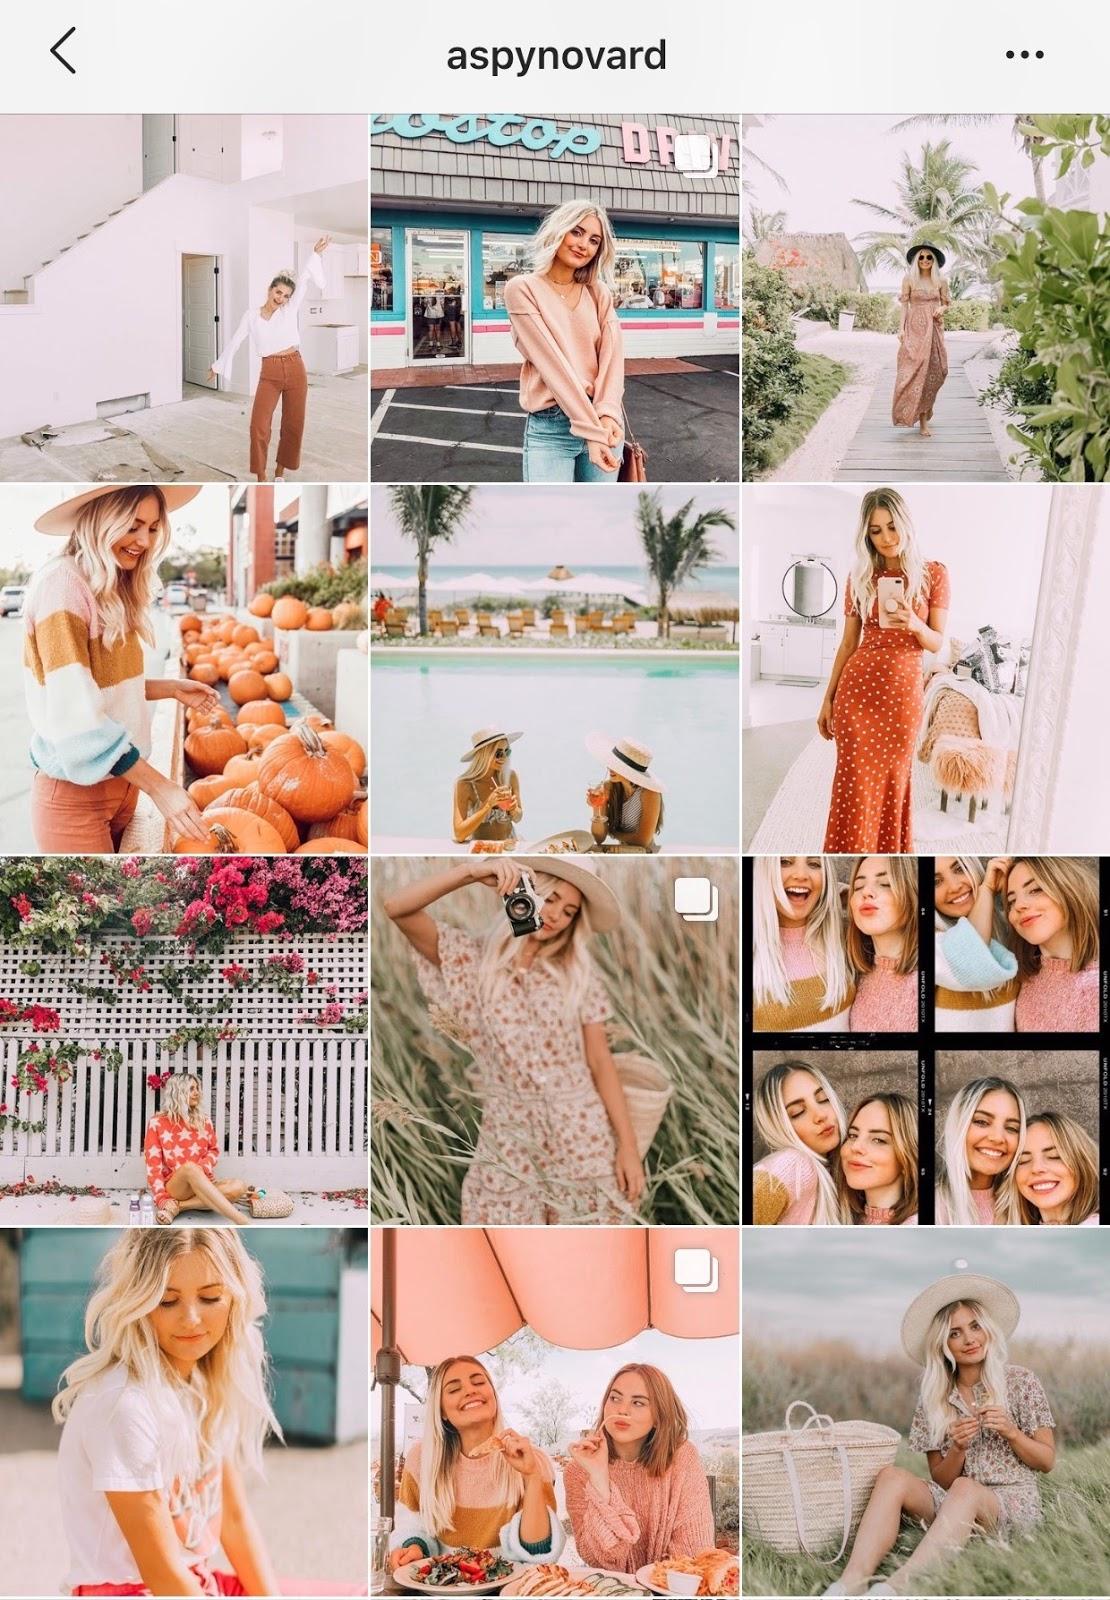 Beginner's Guide to Instagram for Business - Chainlink Relationship Marketing